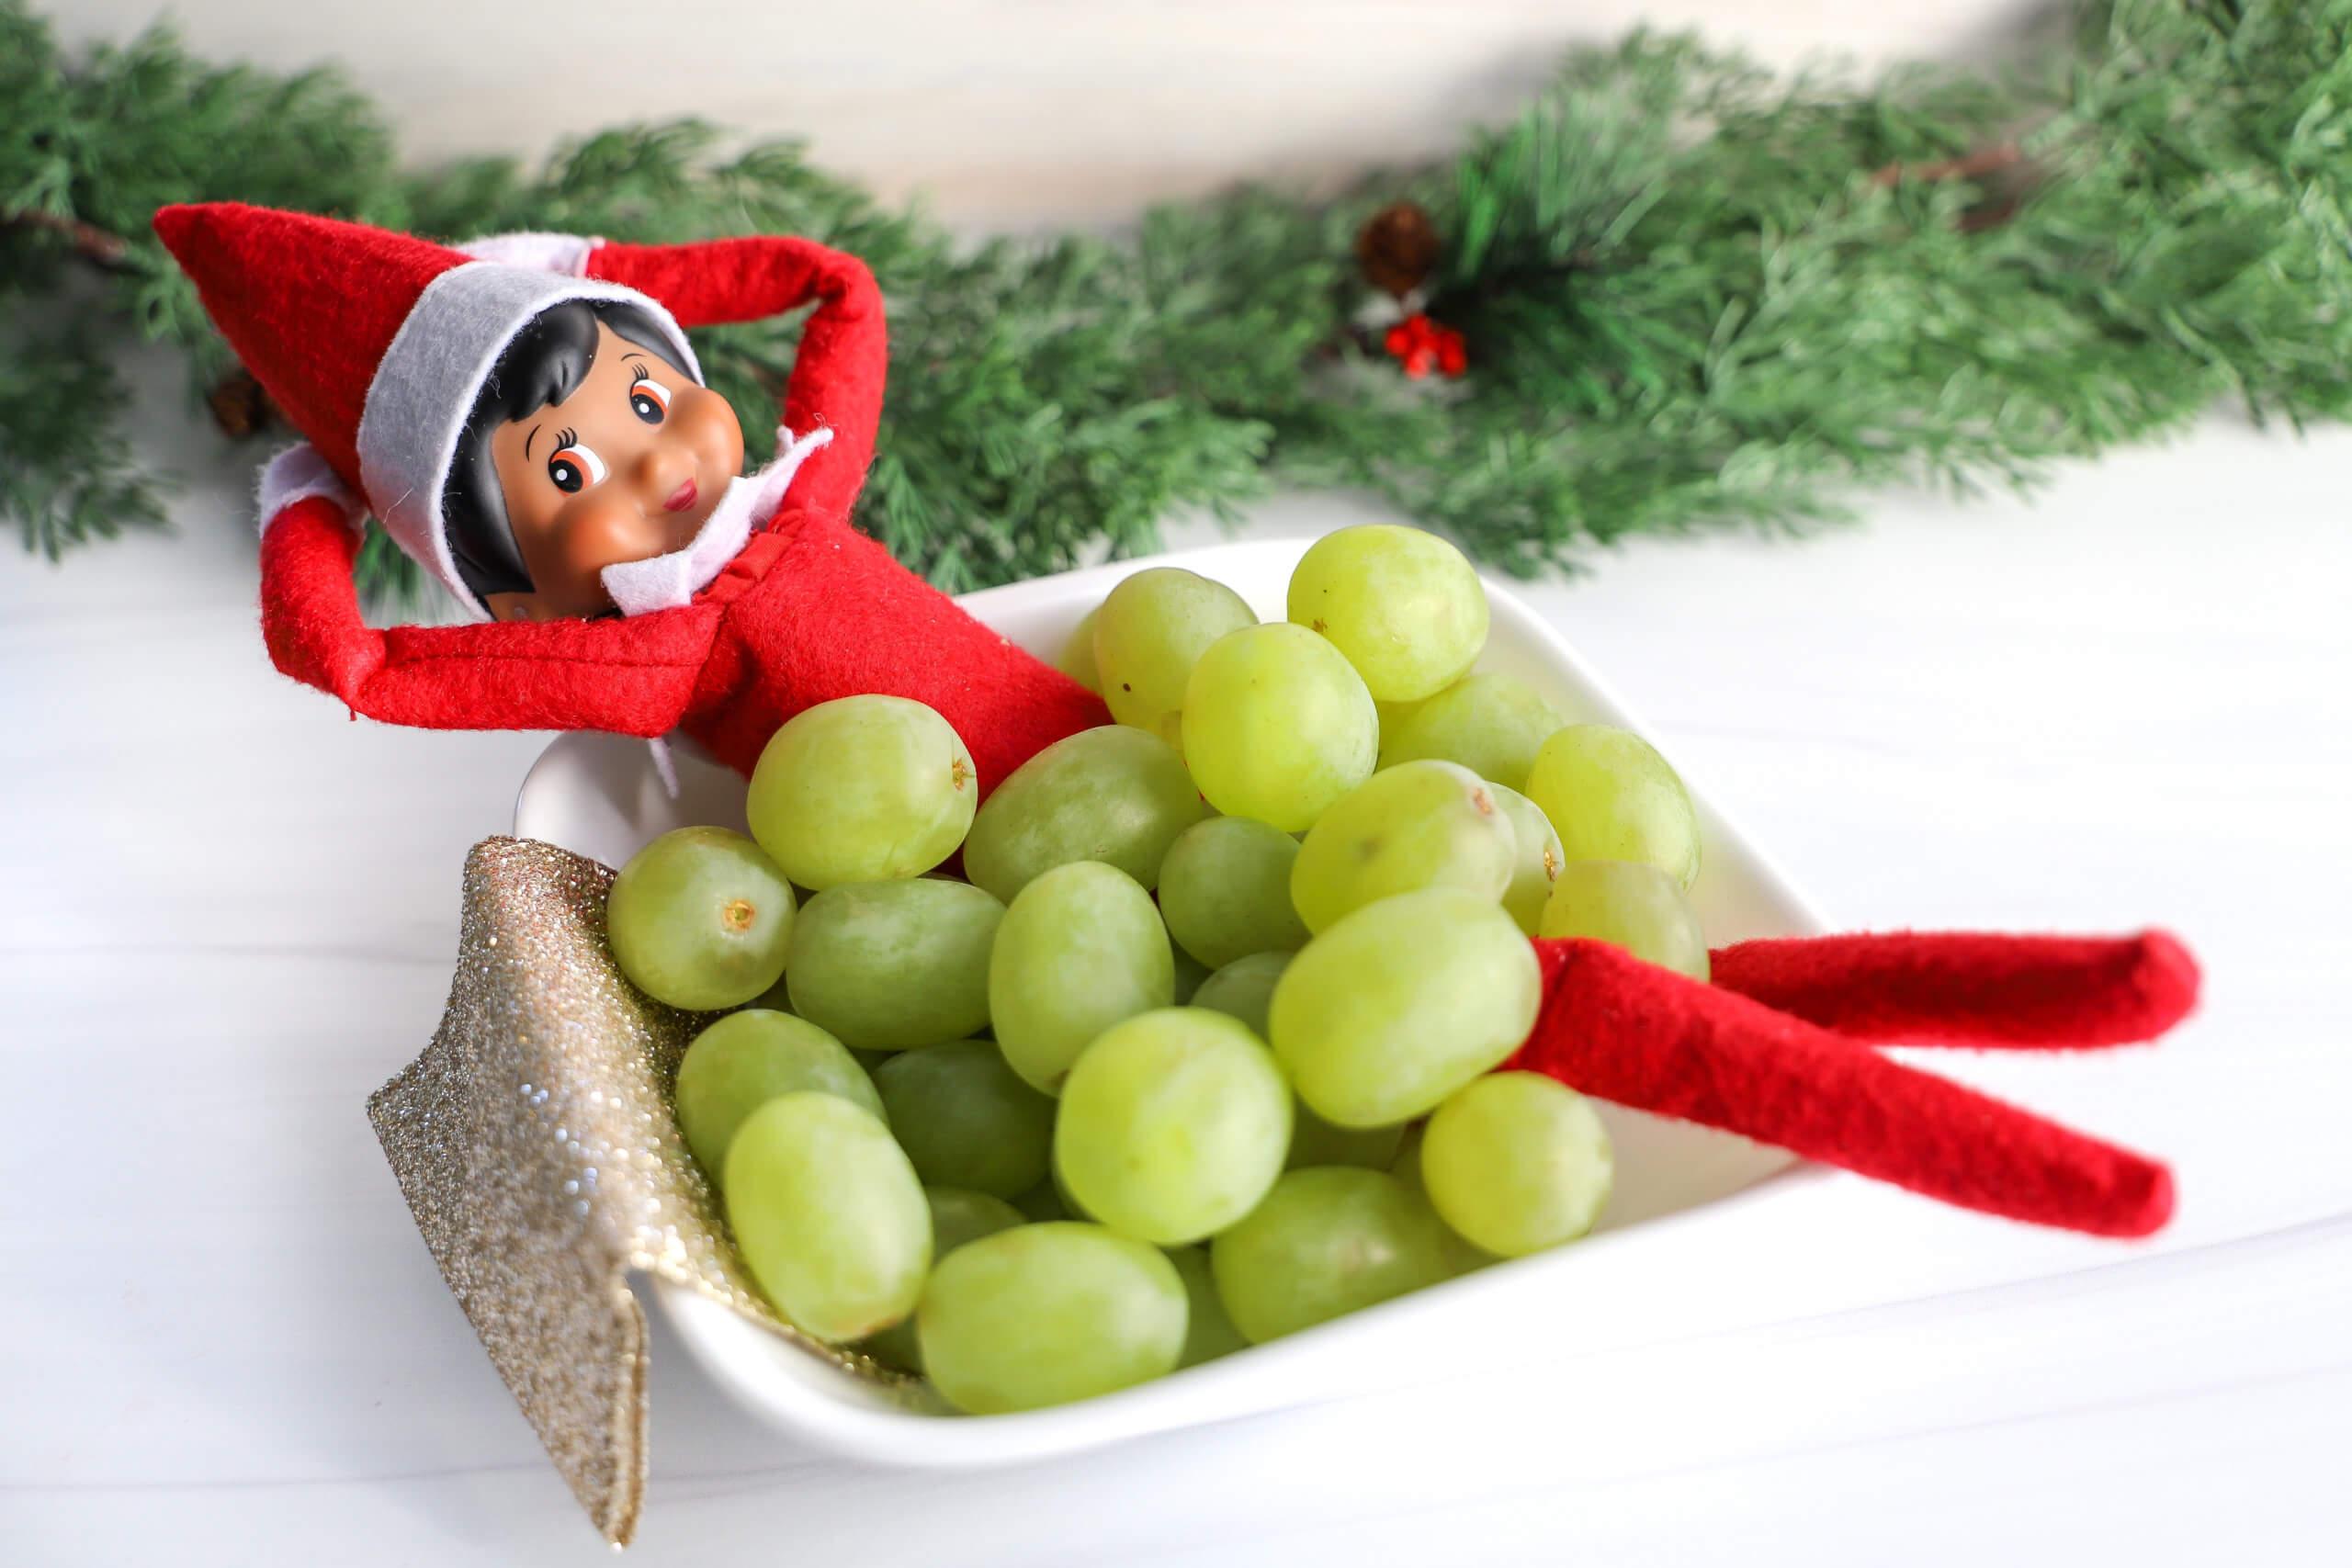 Easy Elf on the Shelf Ideas: Grape Bubble Bath